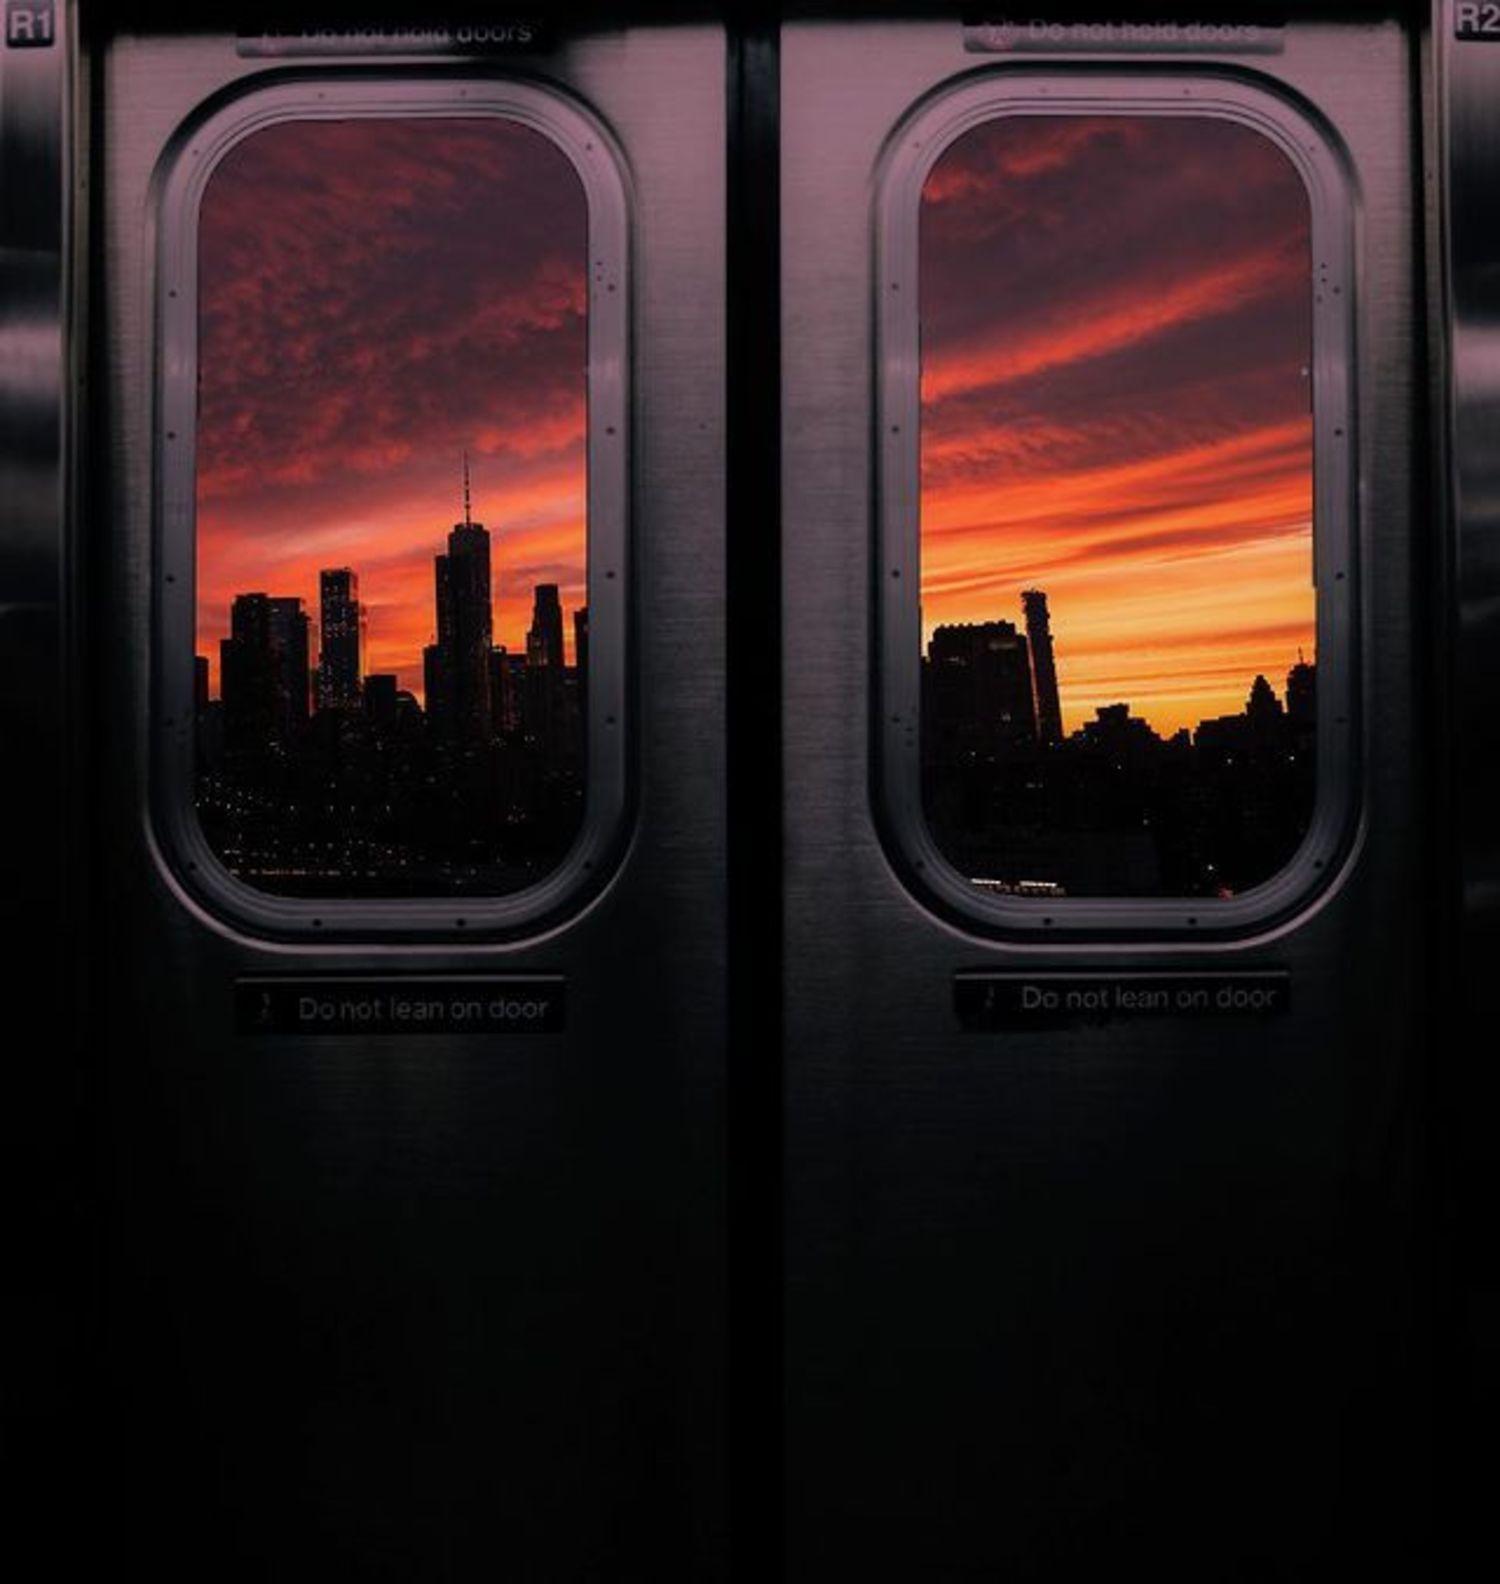 Sunset over Lower Manhattan from Q Train, Manhattan Bridge